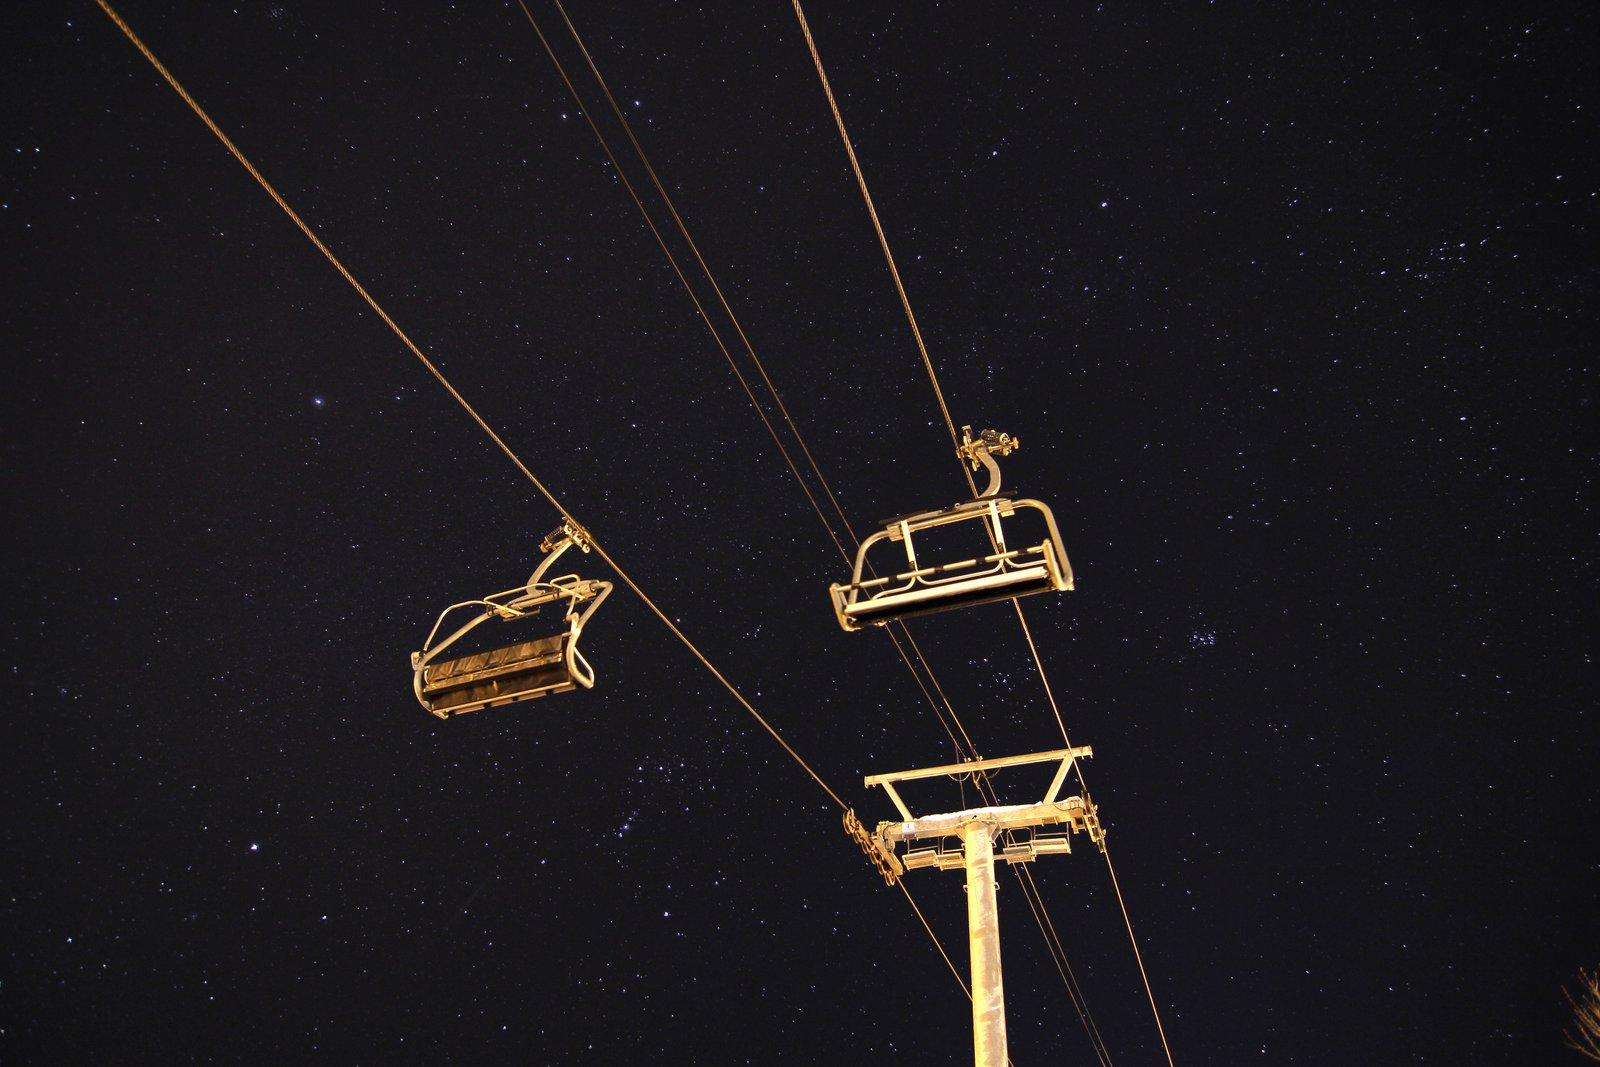 Kimberly Chairlift under stars